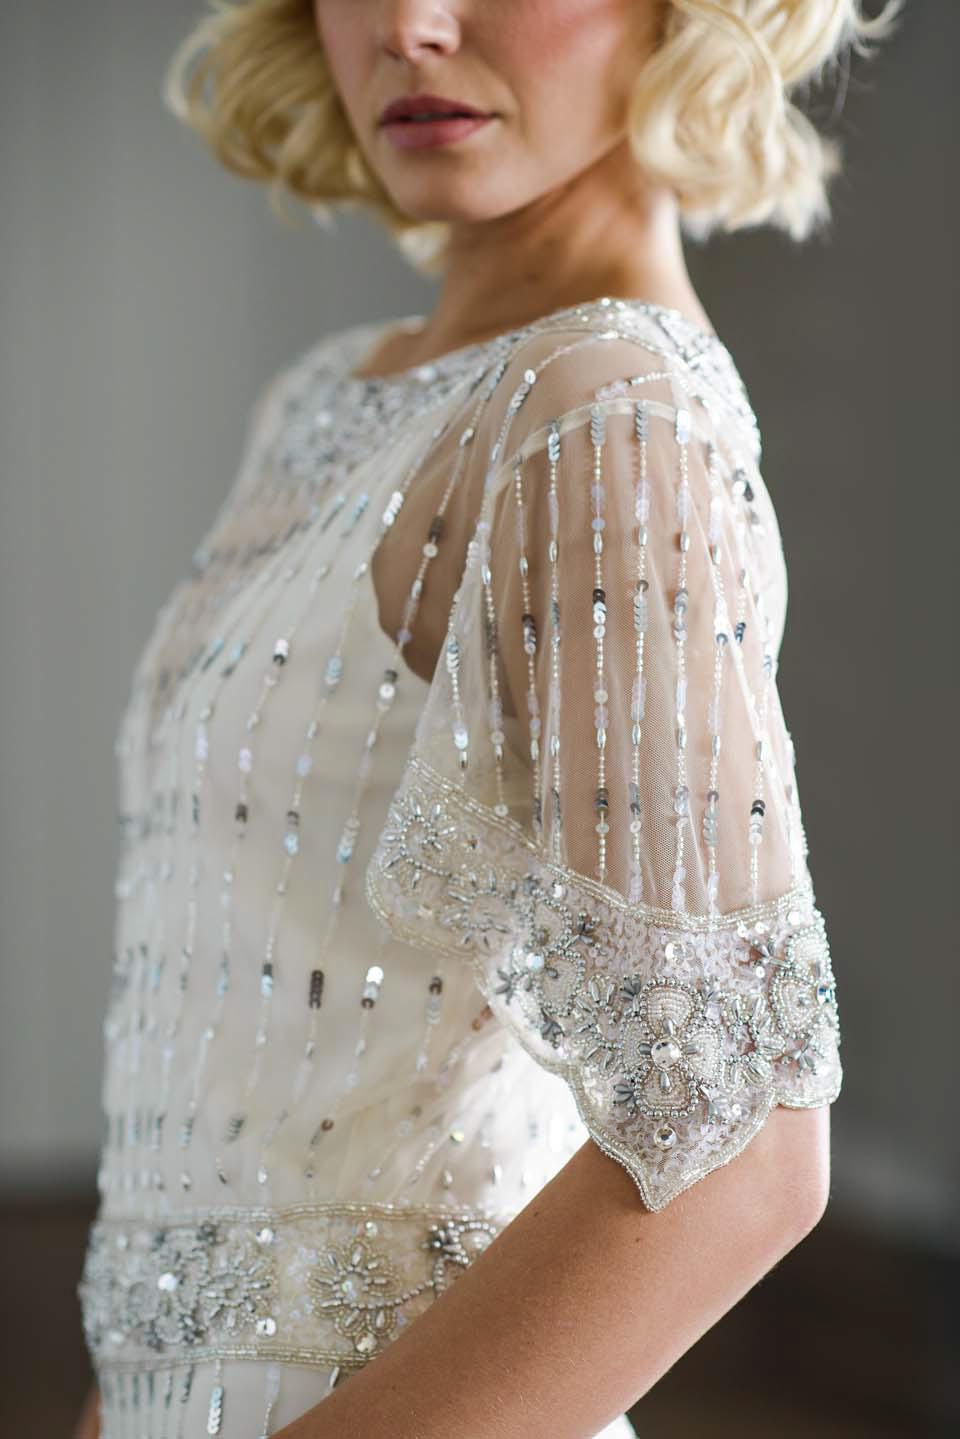 Spanish Inspired Wedding Dress | Southern Bride  |Spanish Style Wedding Dresses 1920